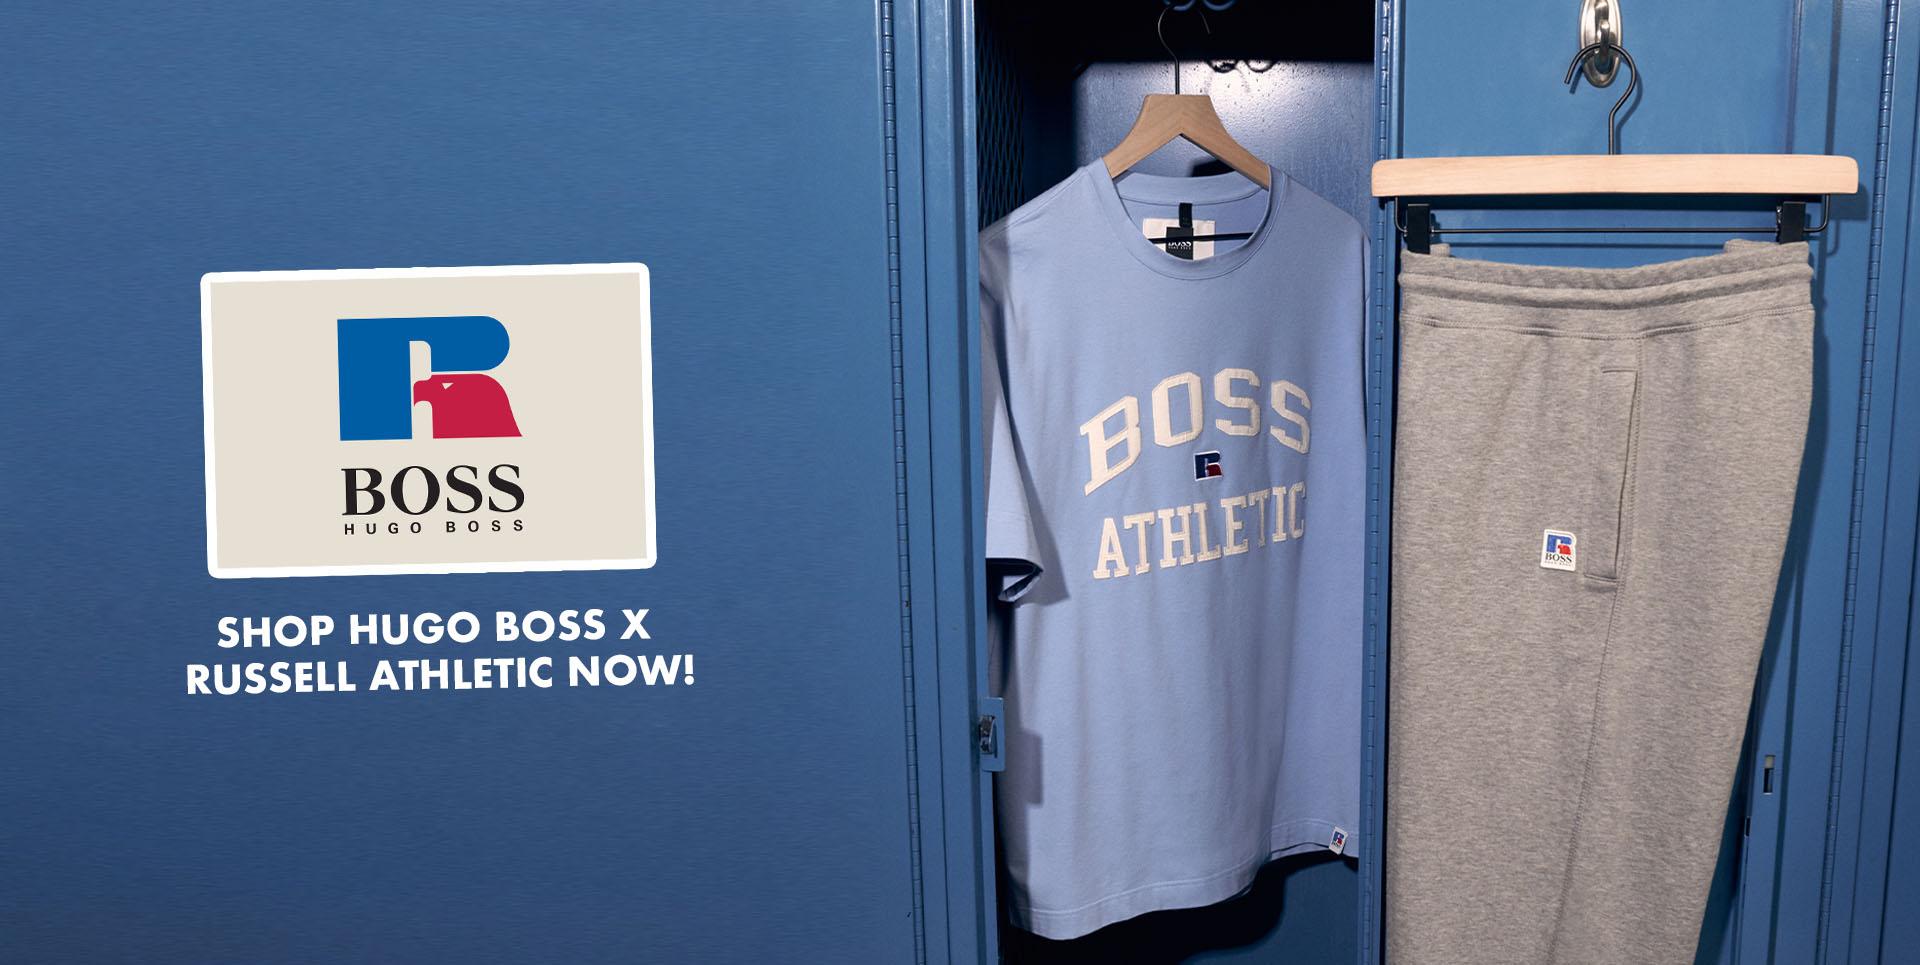 Hugo Boss x Russell